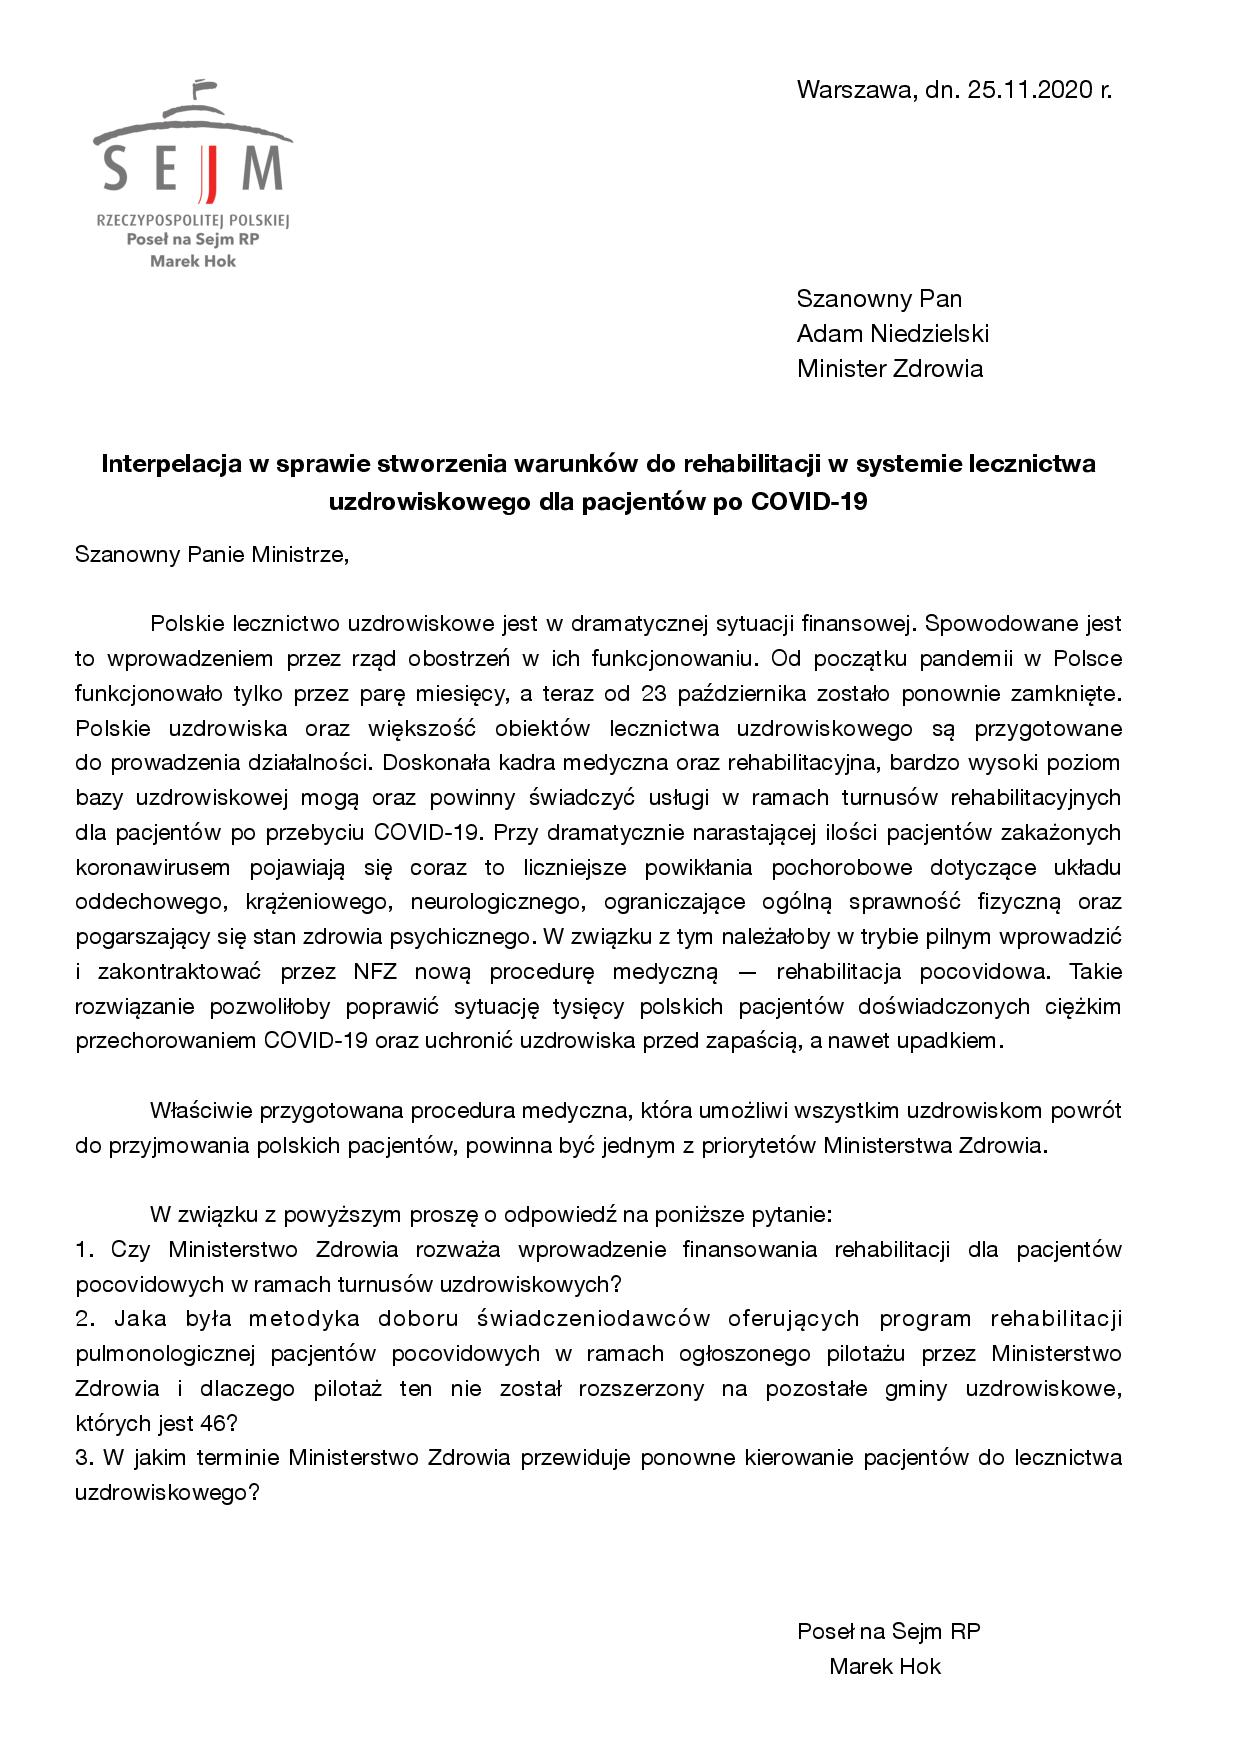 2Interpelacja rehabilitacja COVID 19 page 001